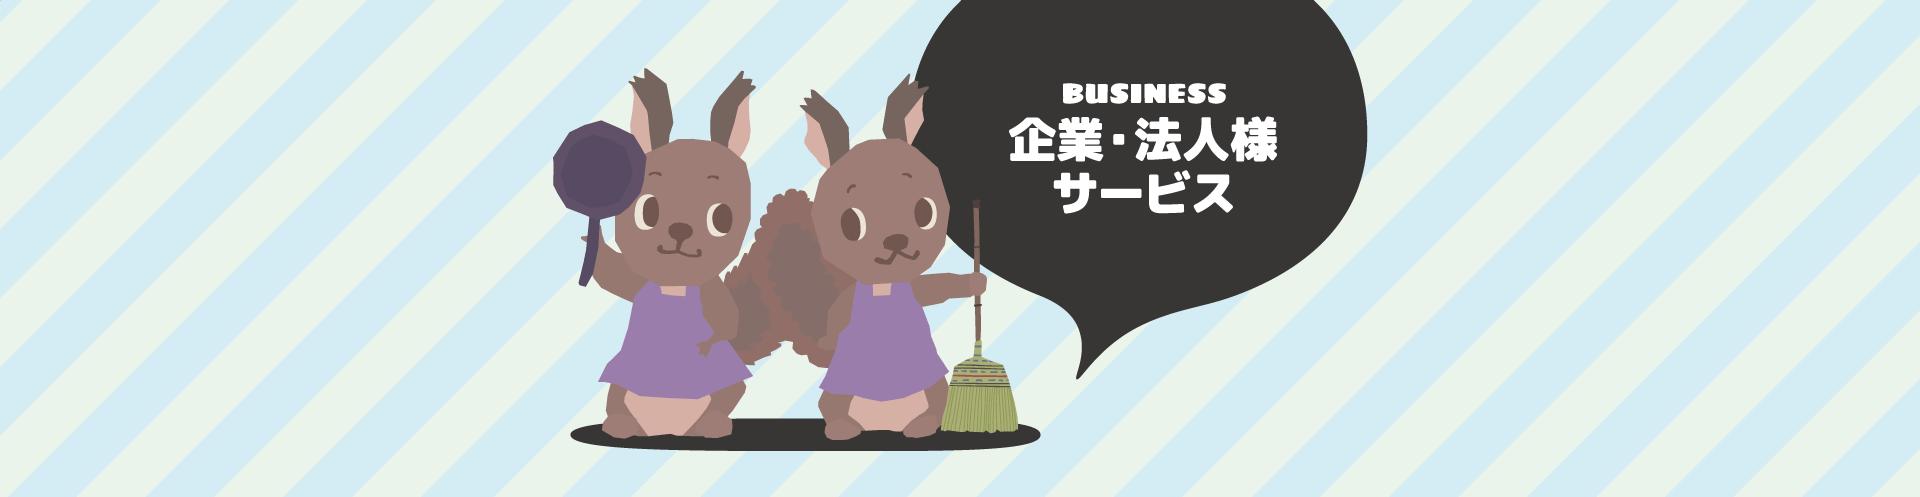 business-企業・法人様サービス